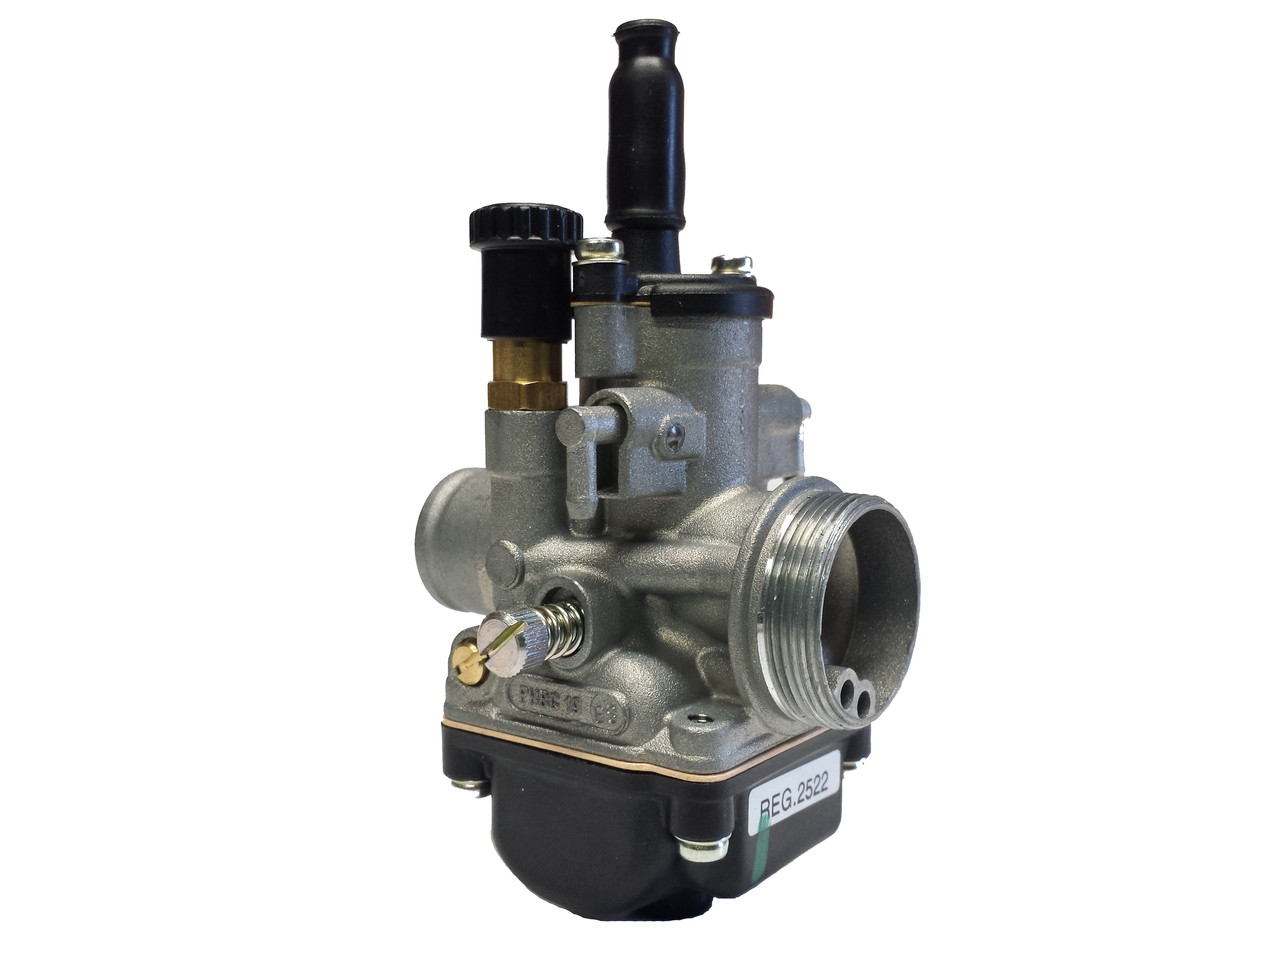 Dellorto 19mm PHBG BS Carburetor with Pull Choke